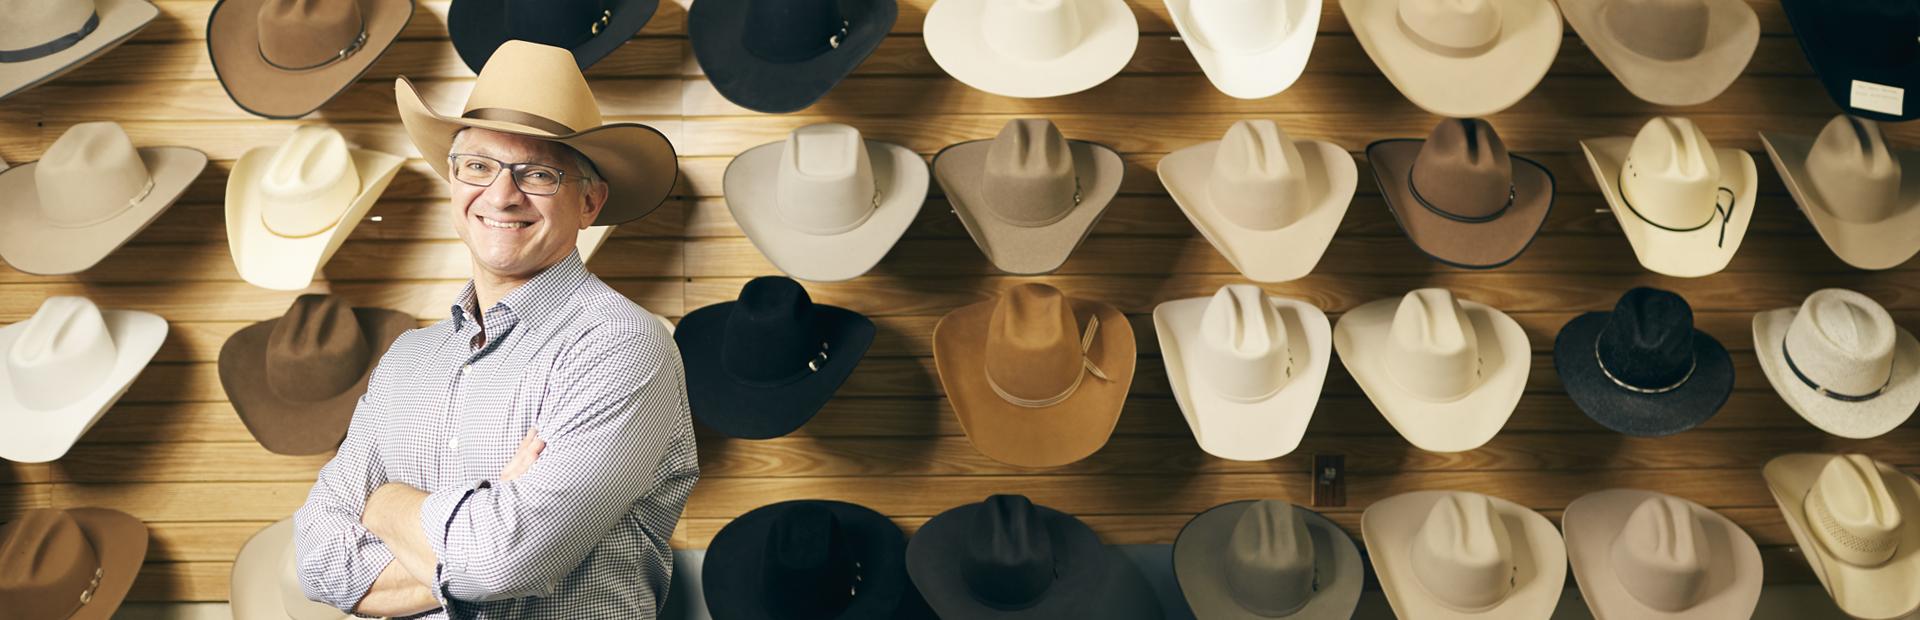 What NJBIA Members Are Saying: Serratelli Hat Company